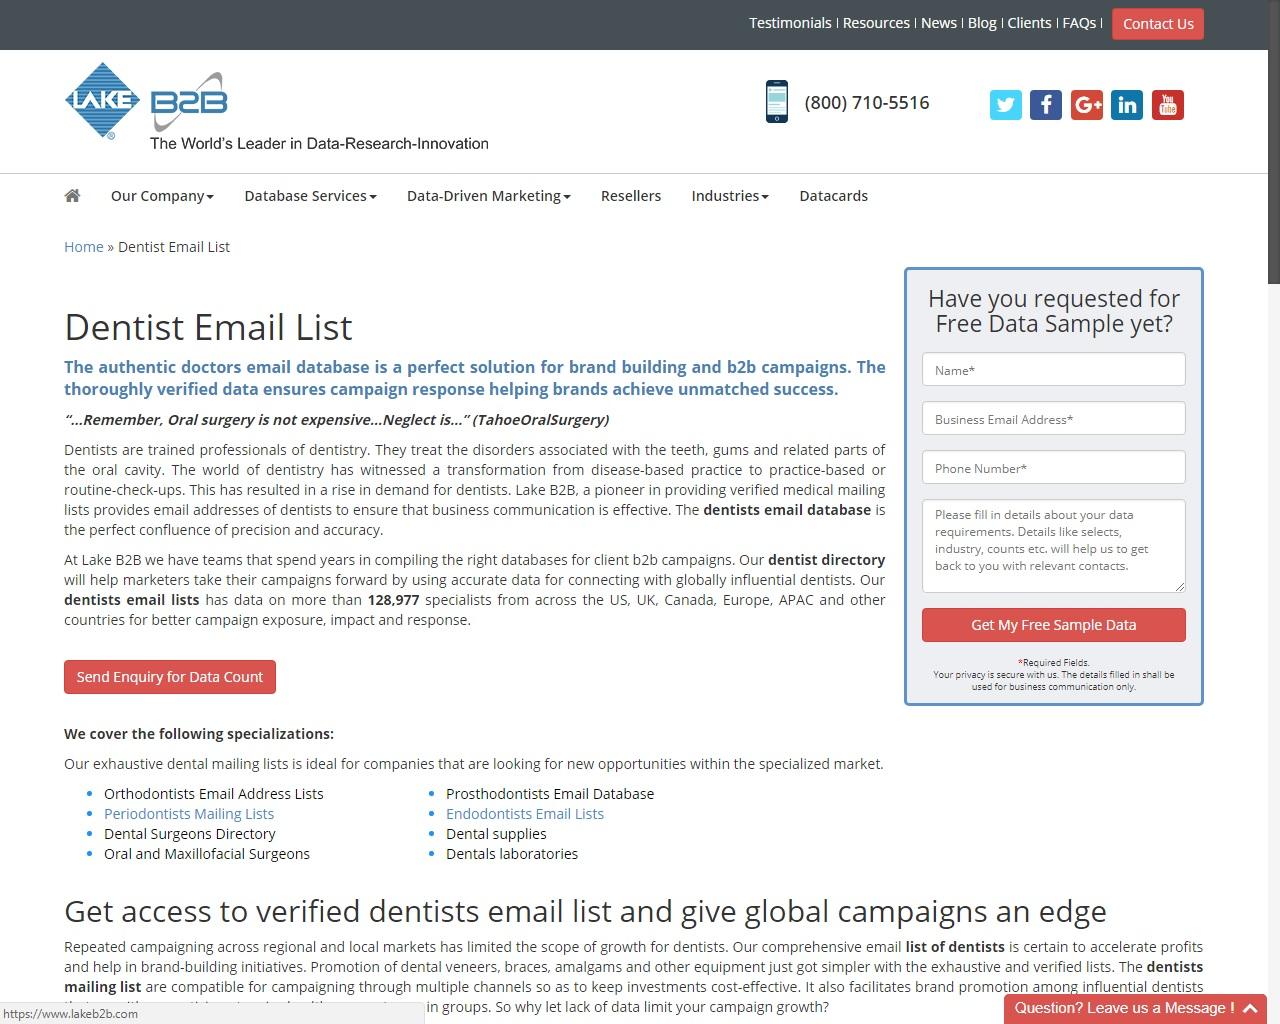 count on dentists mailing list | lake b2b | Armonk, NY | EggZack com